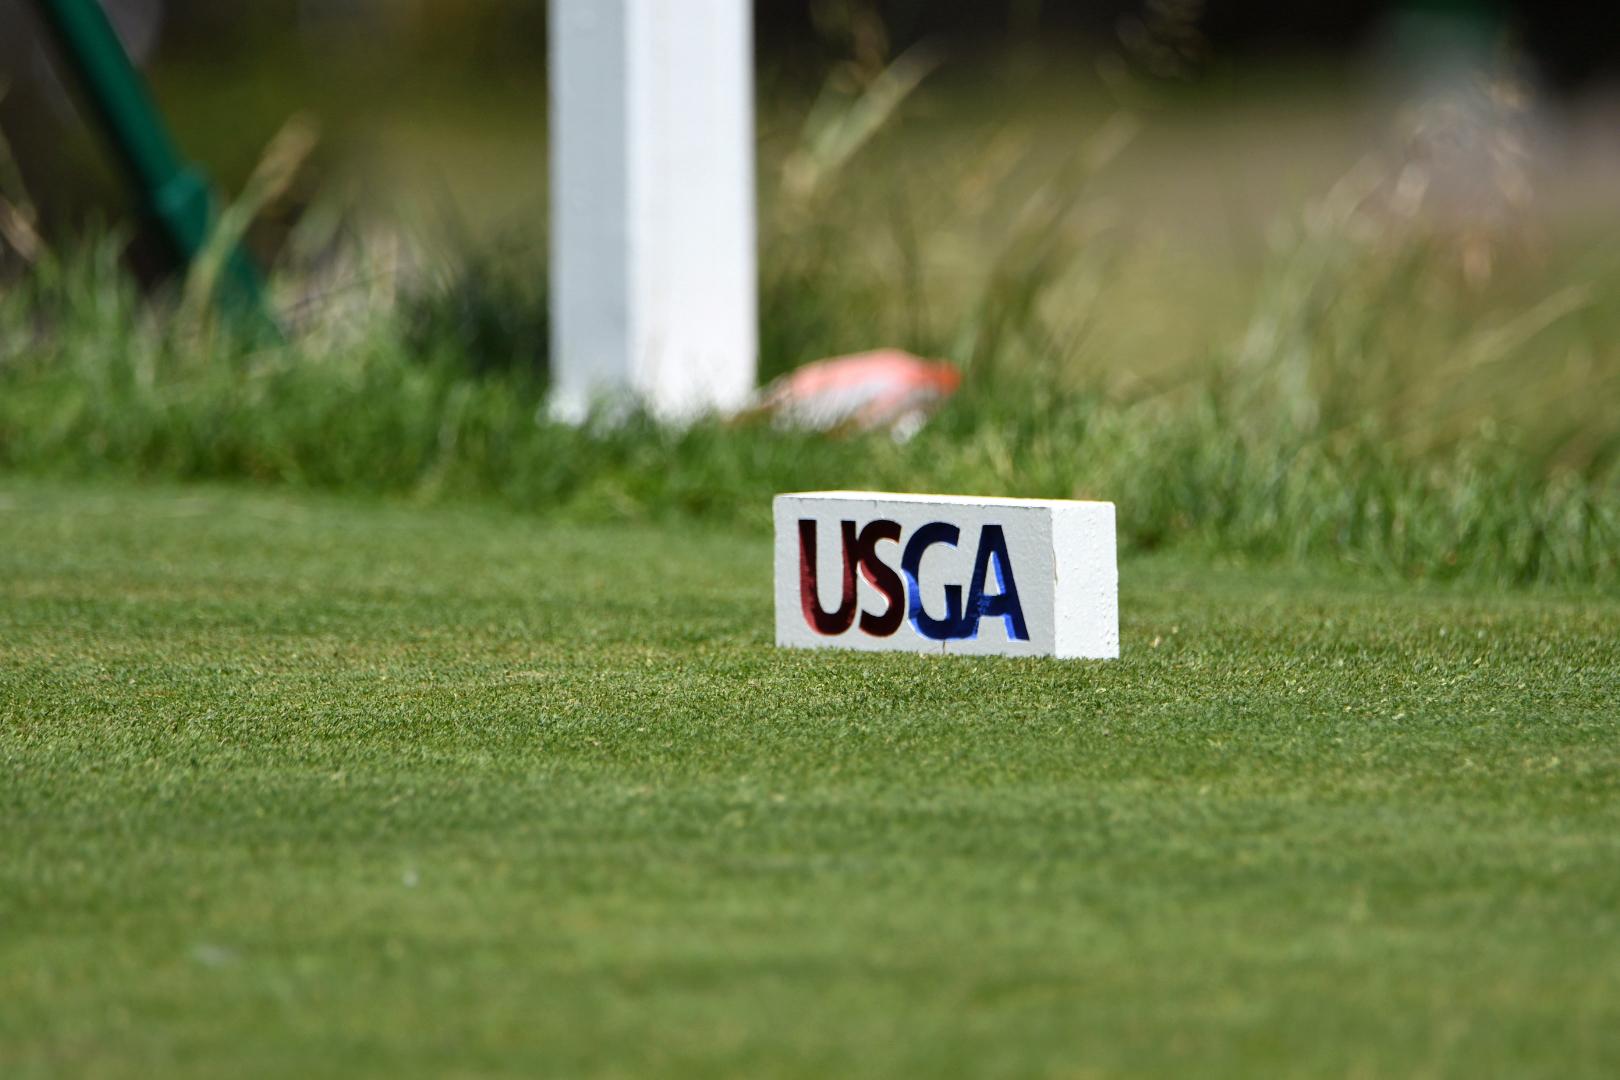 USGA: Round 3 Goes To Stricker